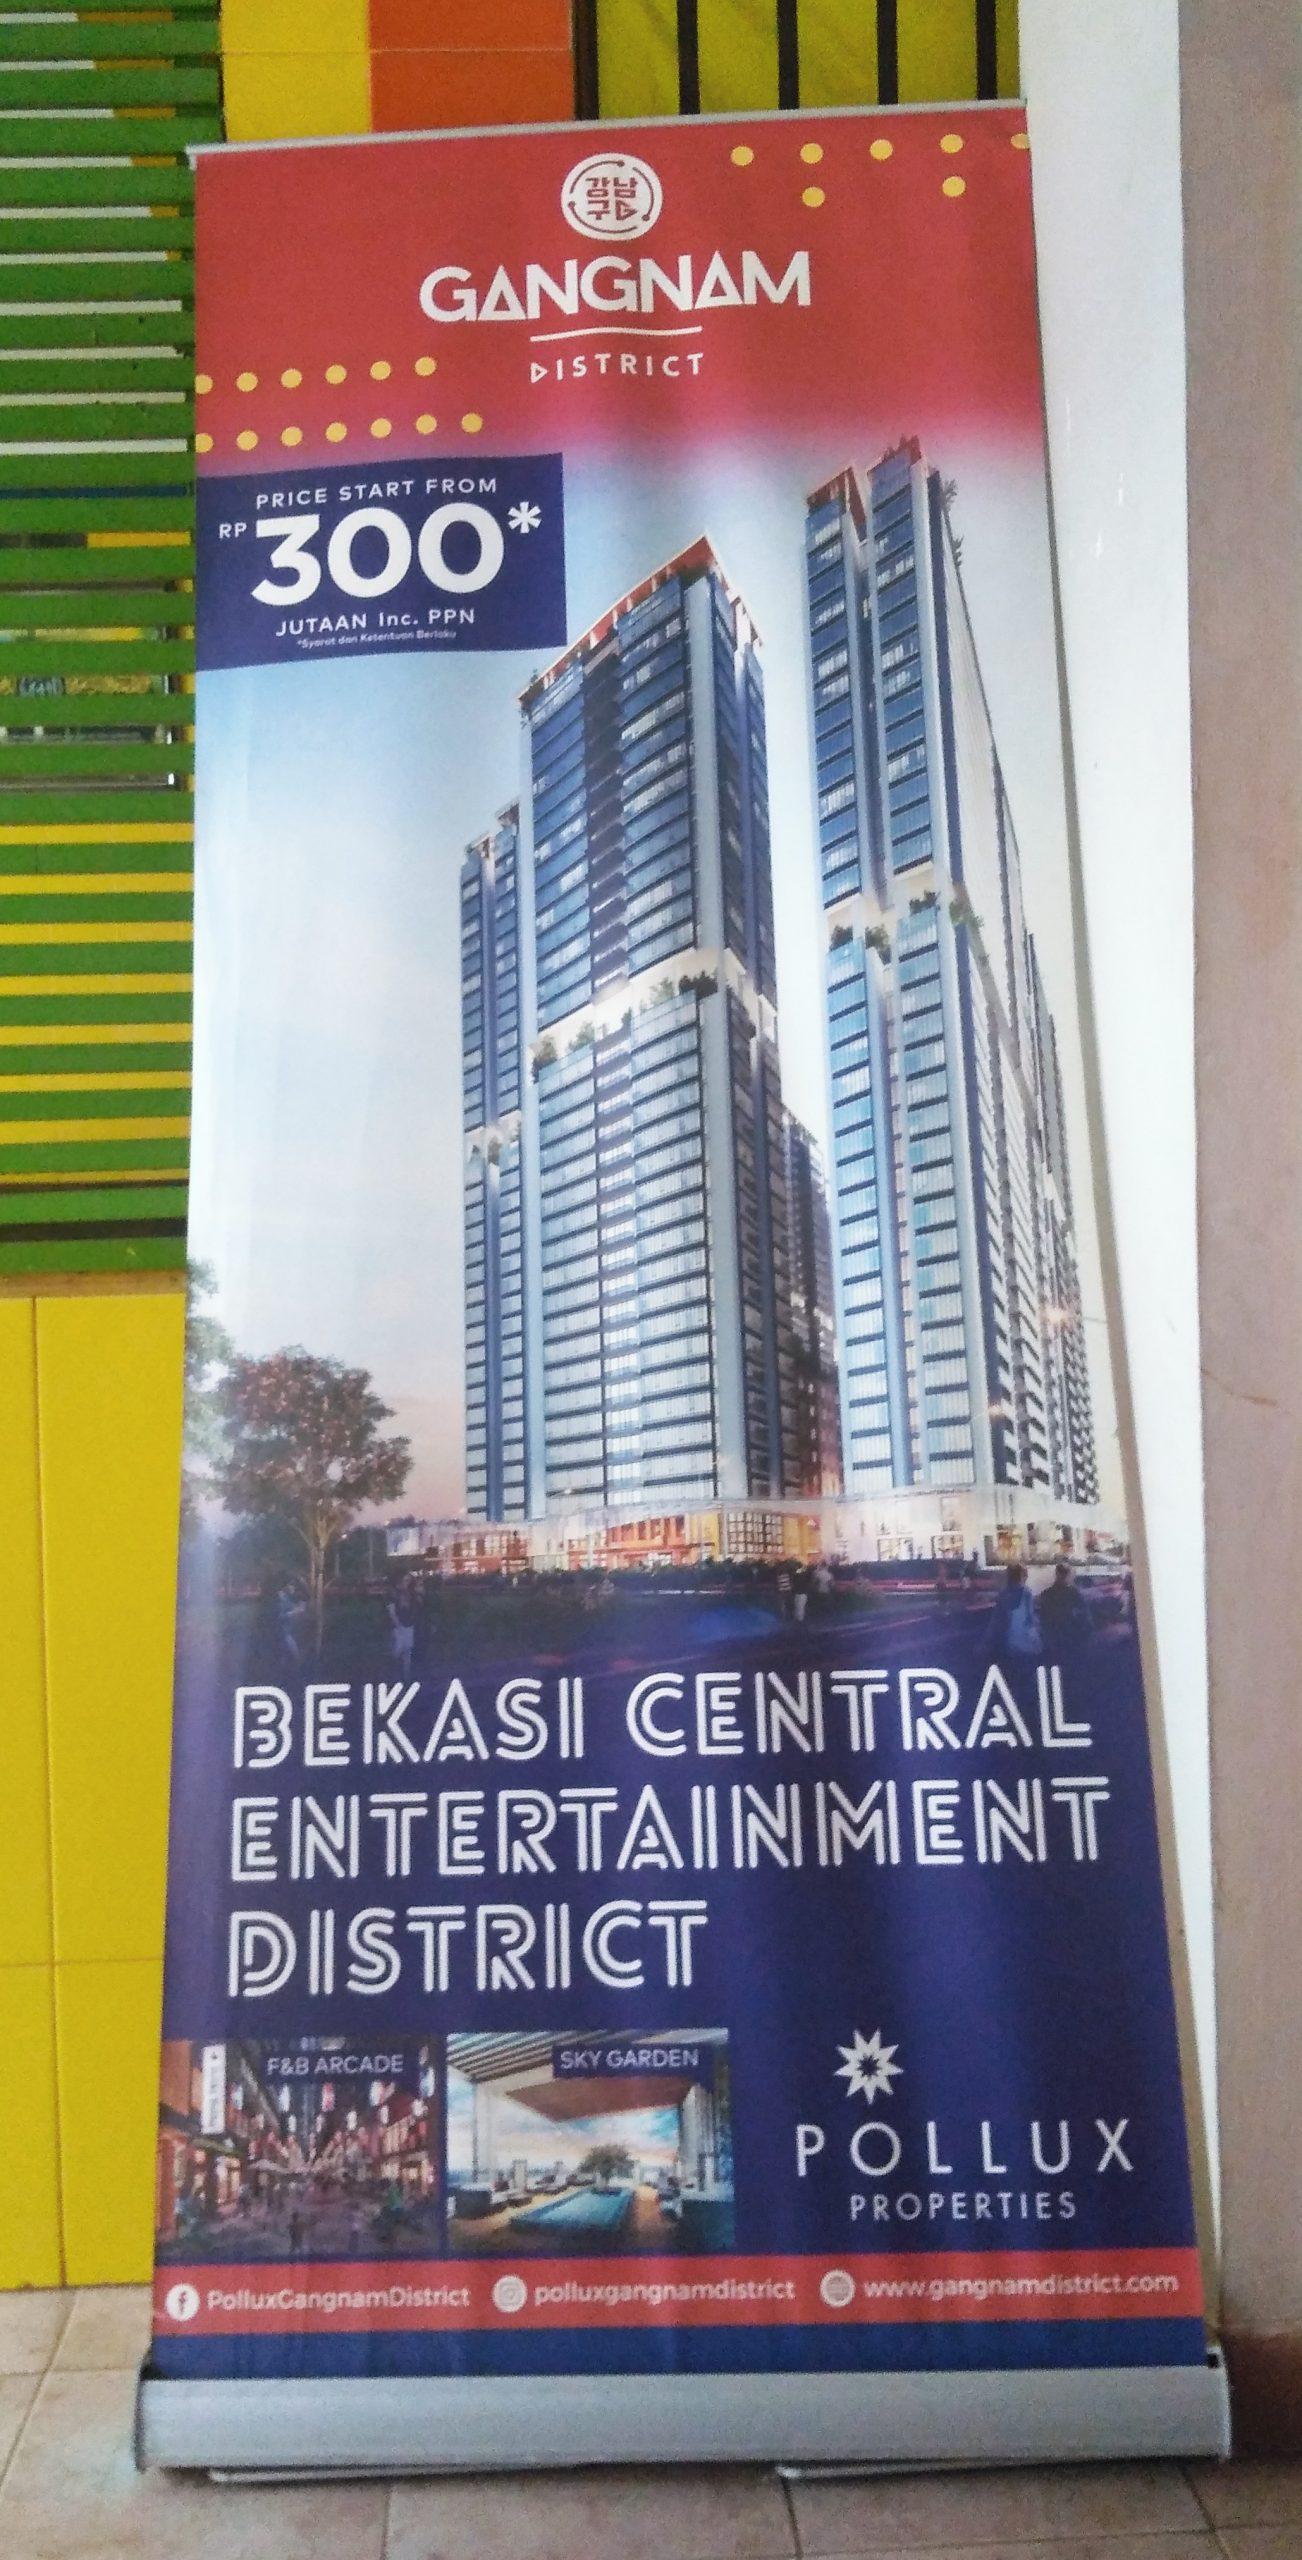 Gangnam itu di Bekasi, bukan Seoul